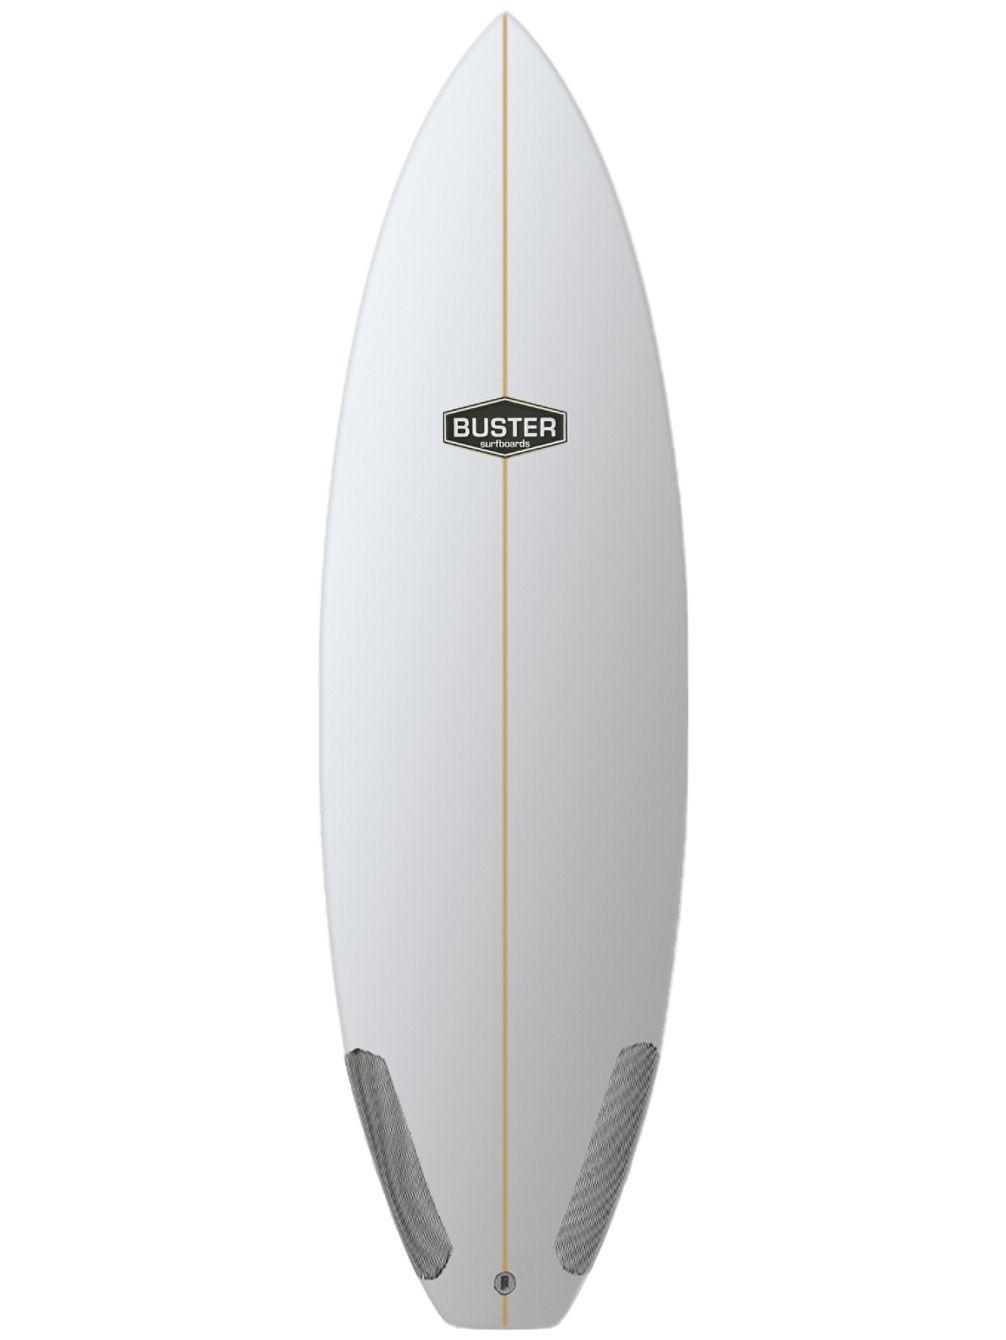 Buster Ripstick 19''5/8 2''1/4 5.11 Surfboard